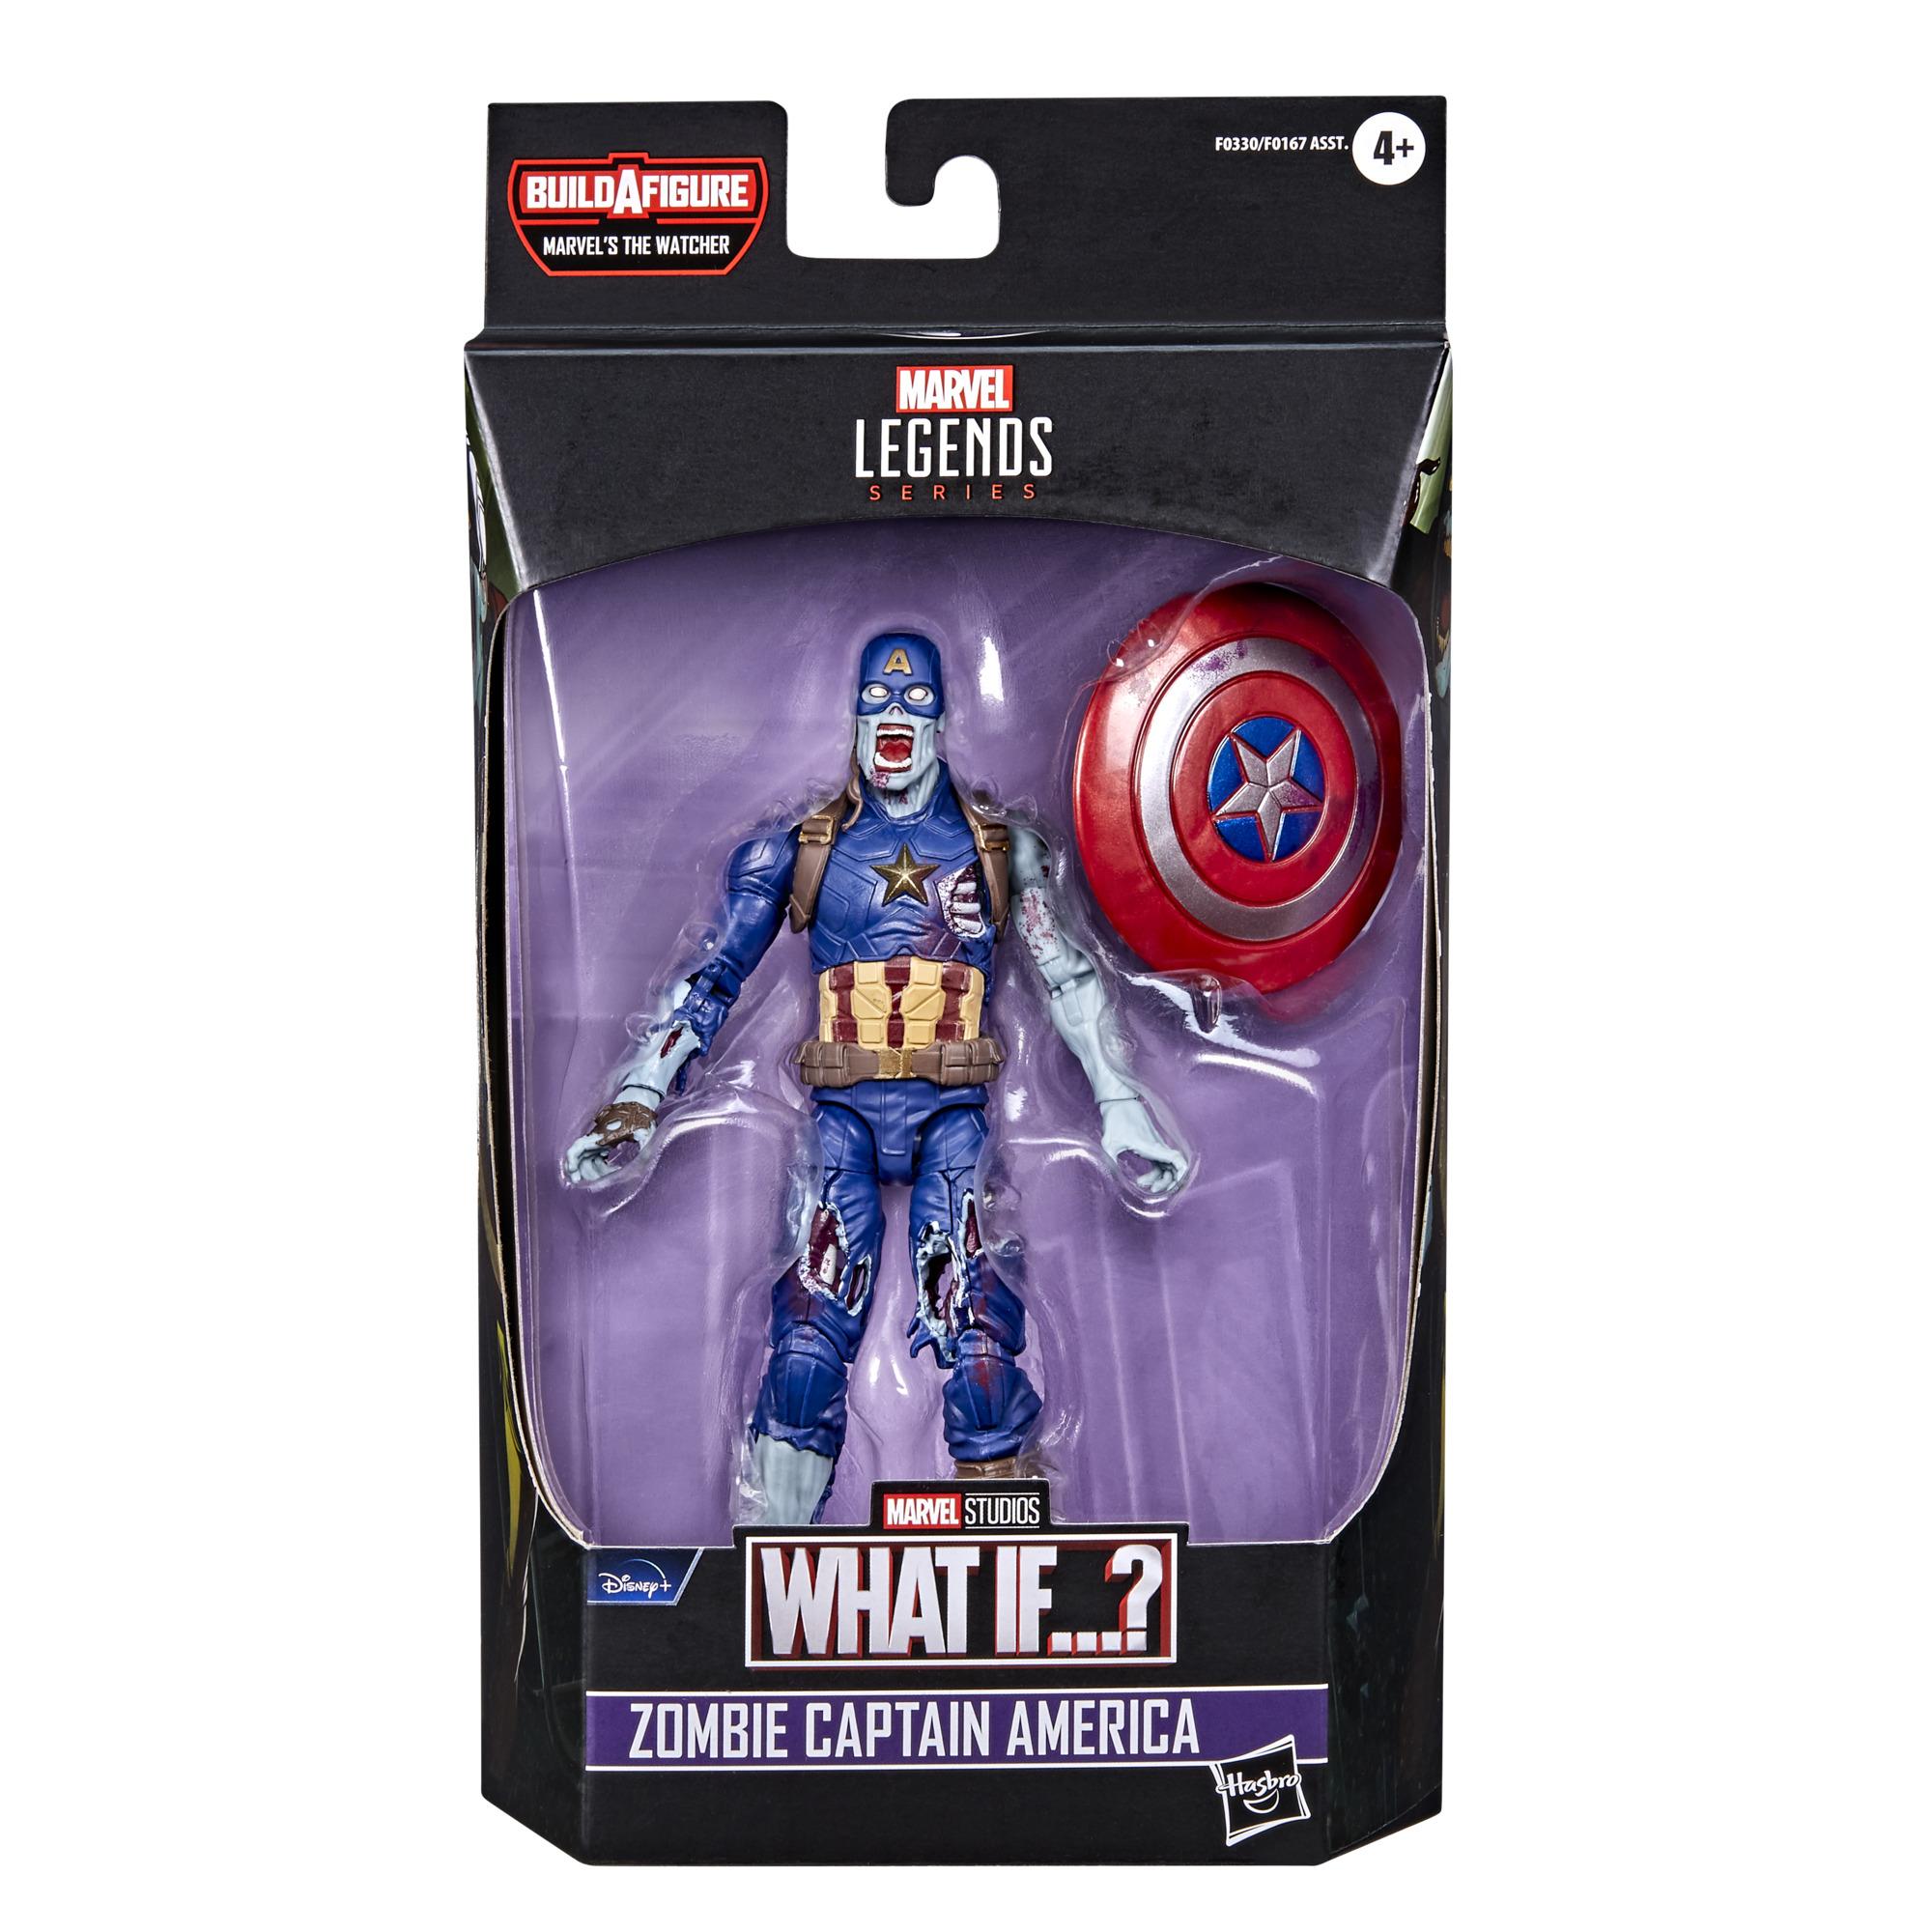 Marvel Legends Series Marvel's Zombie Captain America